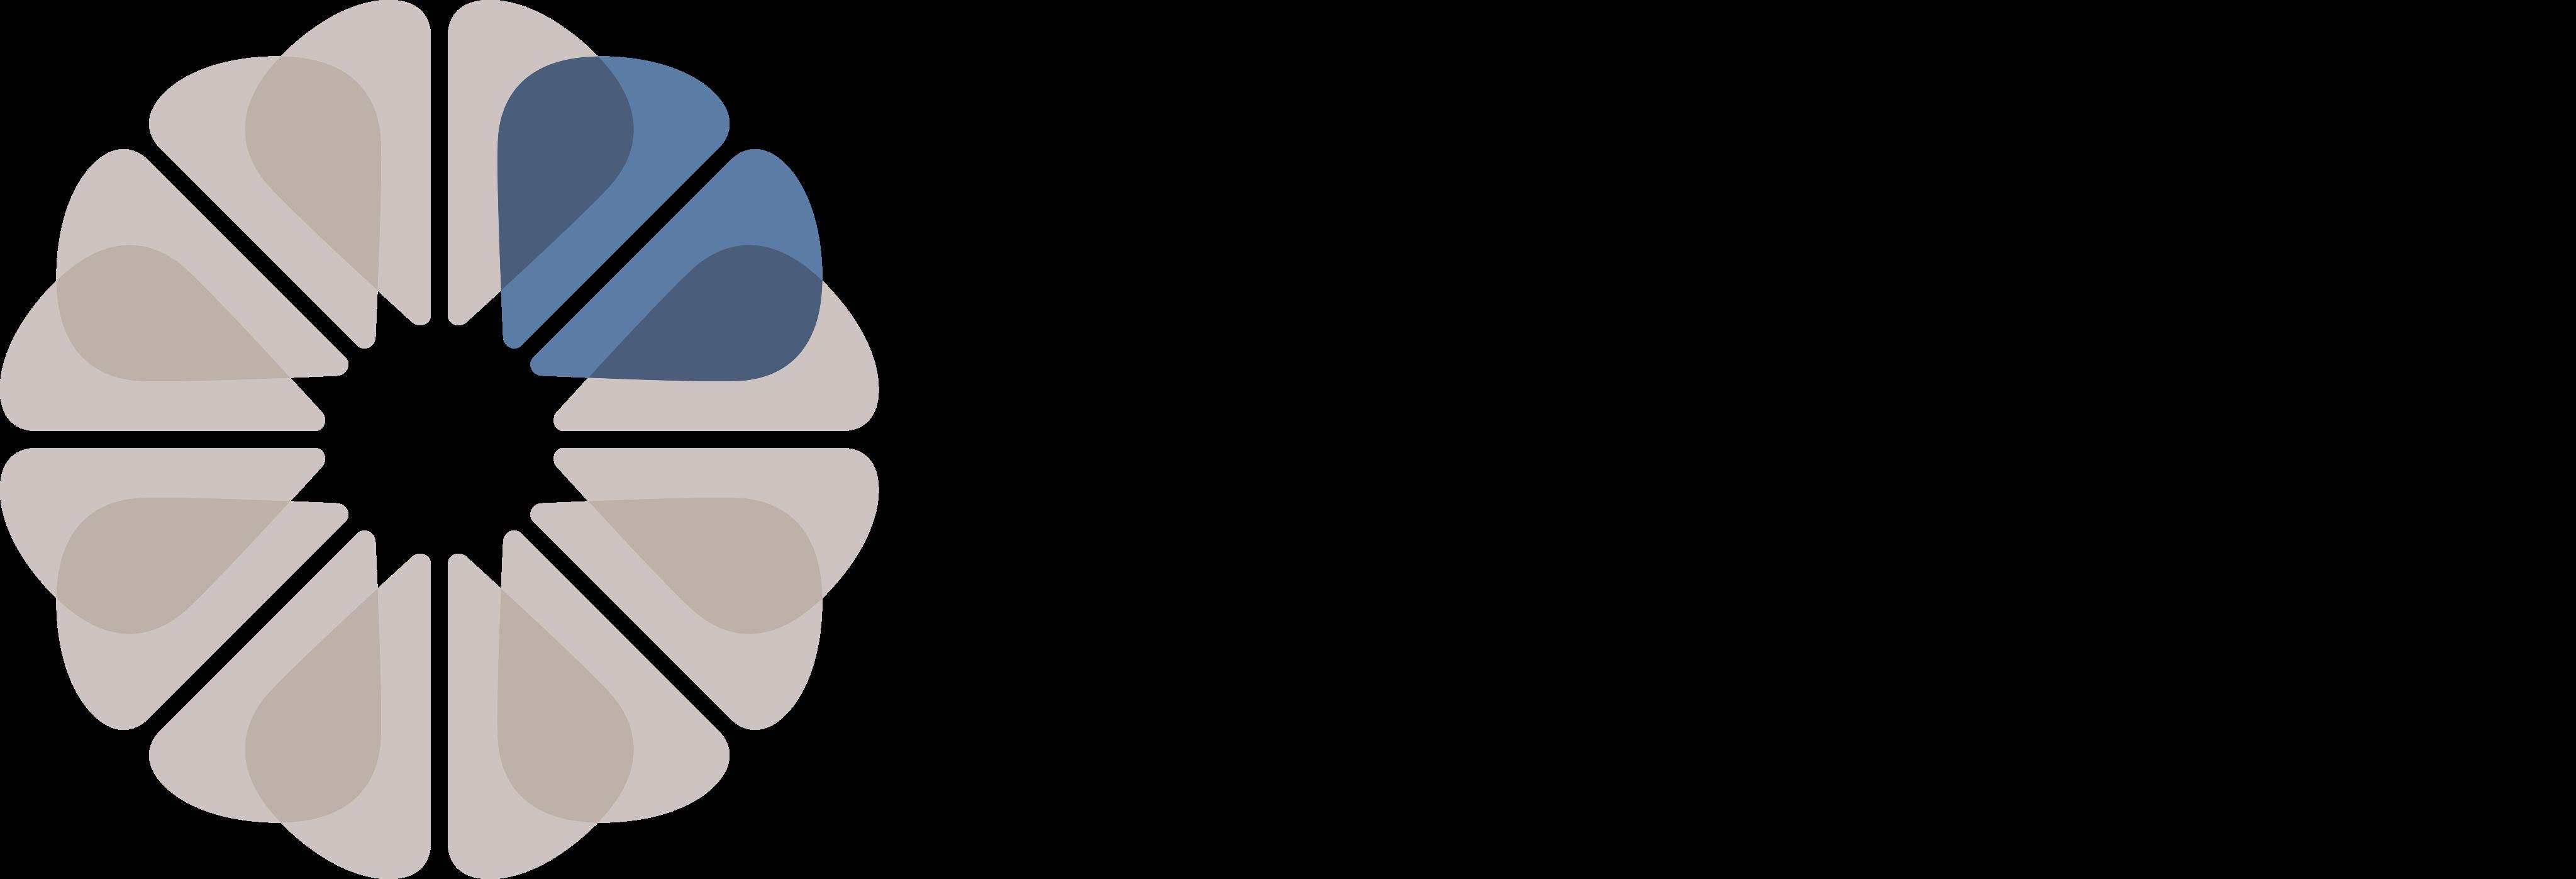 clear corretora logo 2 - Clear Corretora Logo